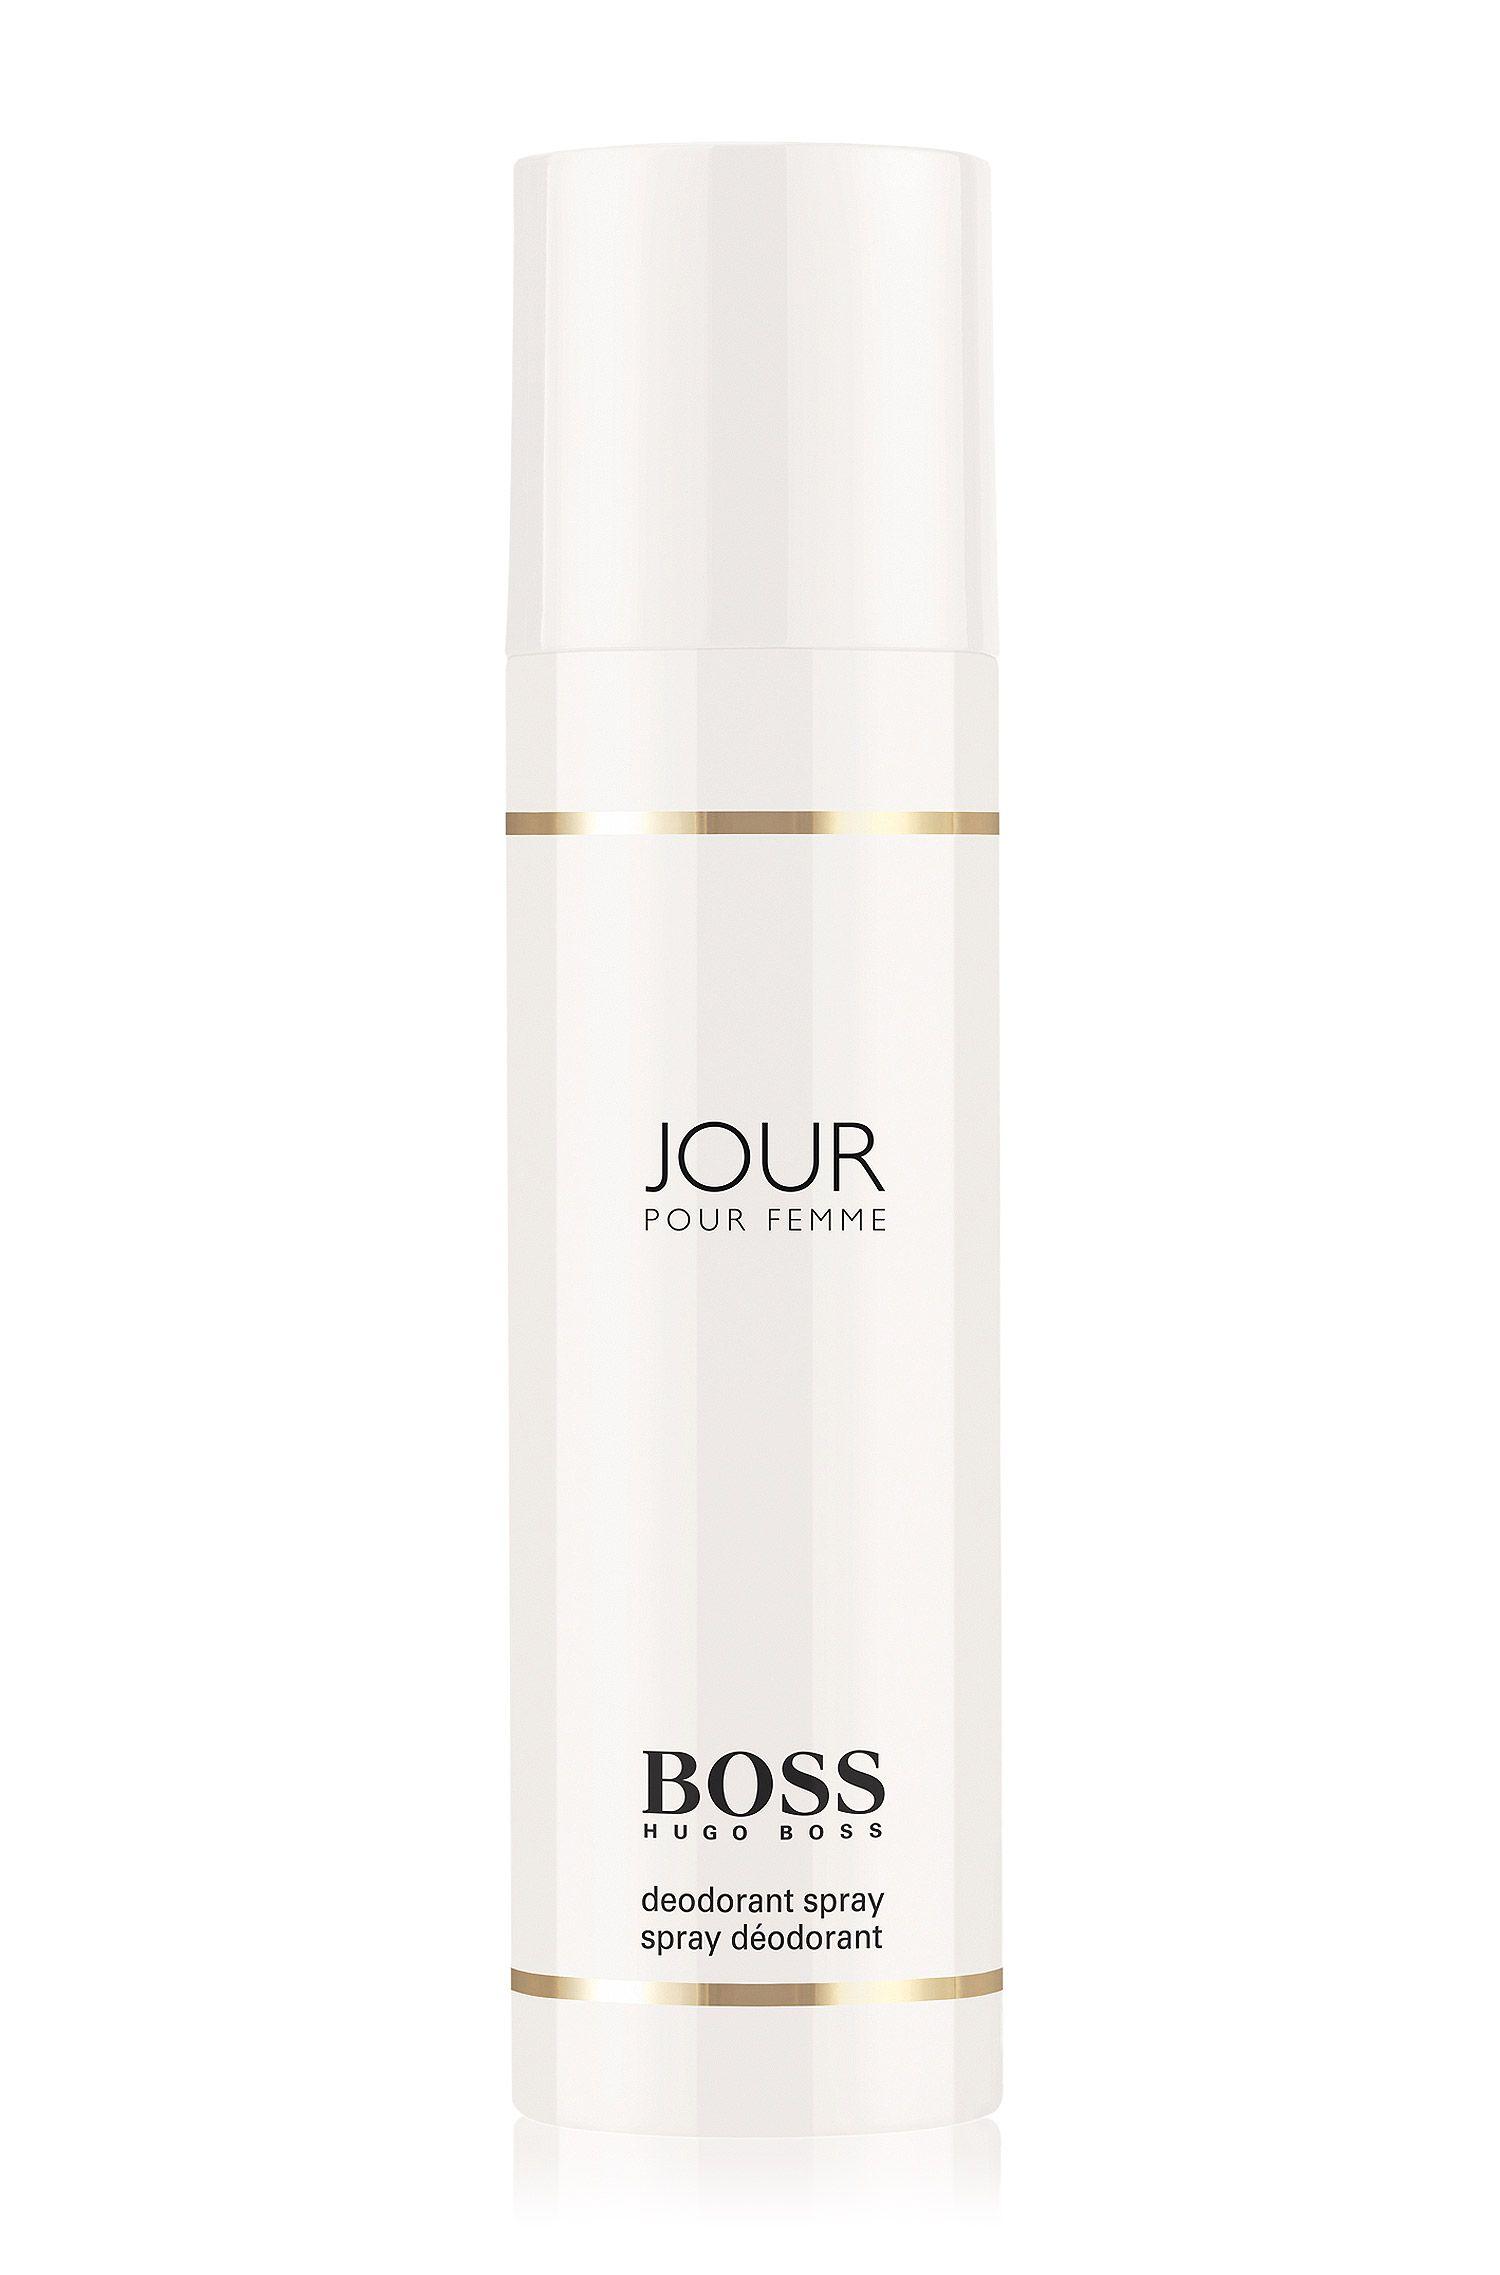 BOSS Jour deodorantspray150 ml